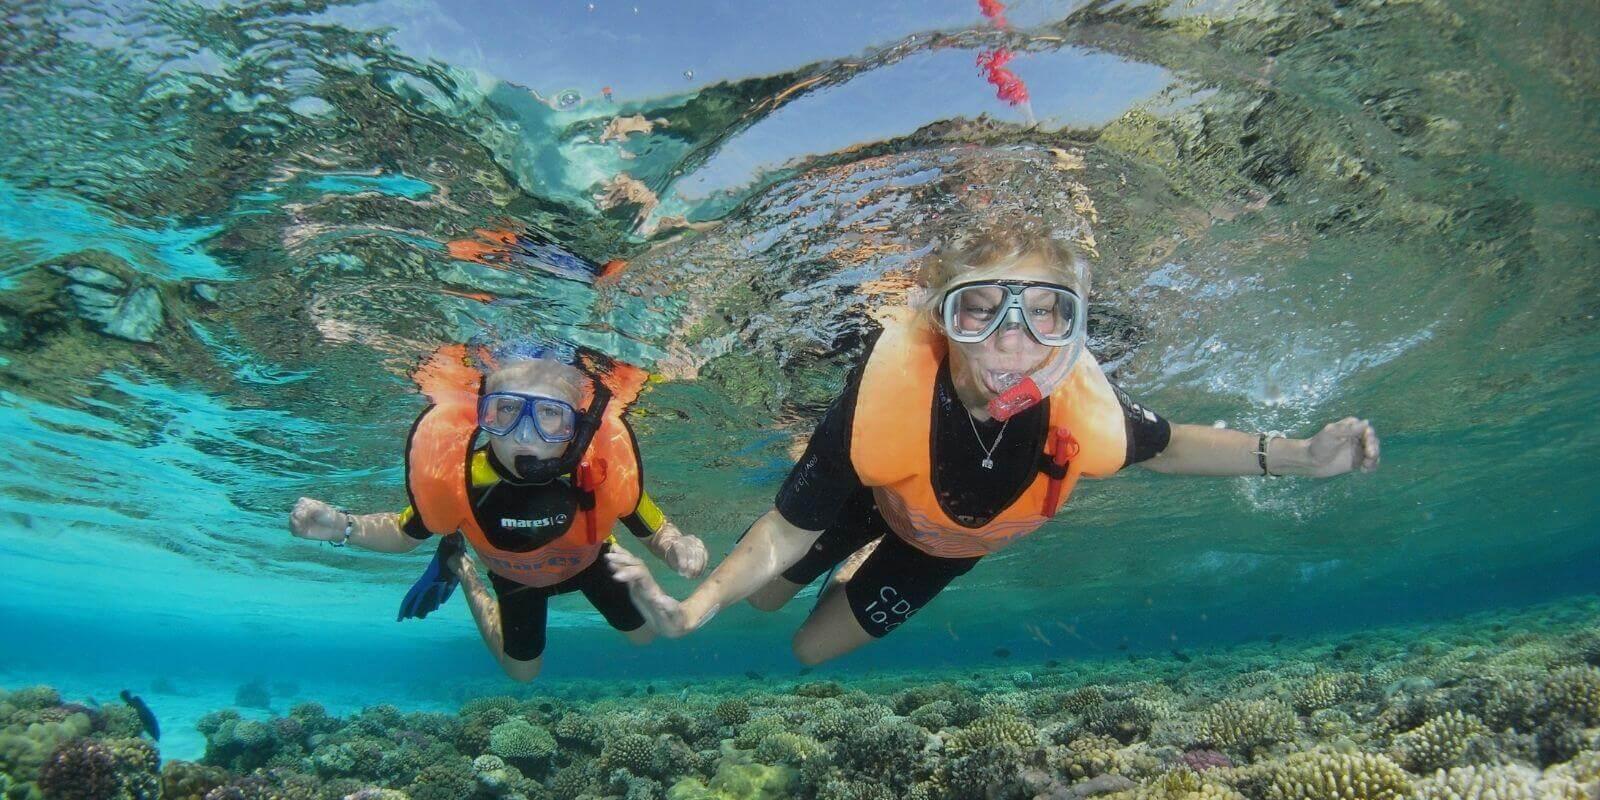 Camel Hotel + Escursioni snorkeling